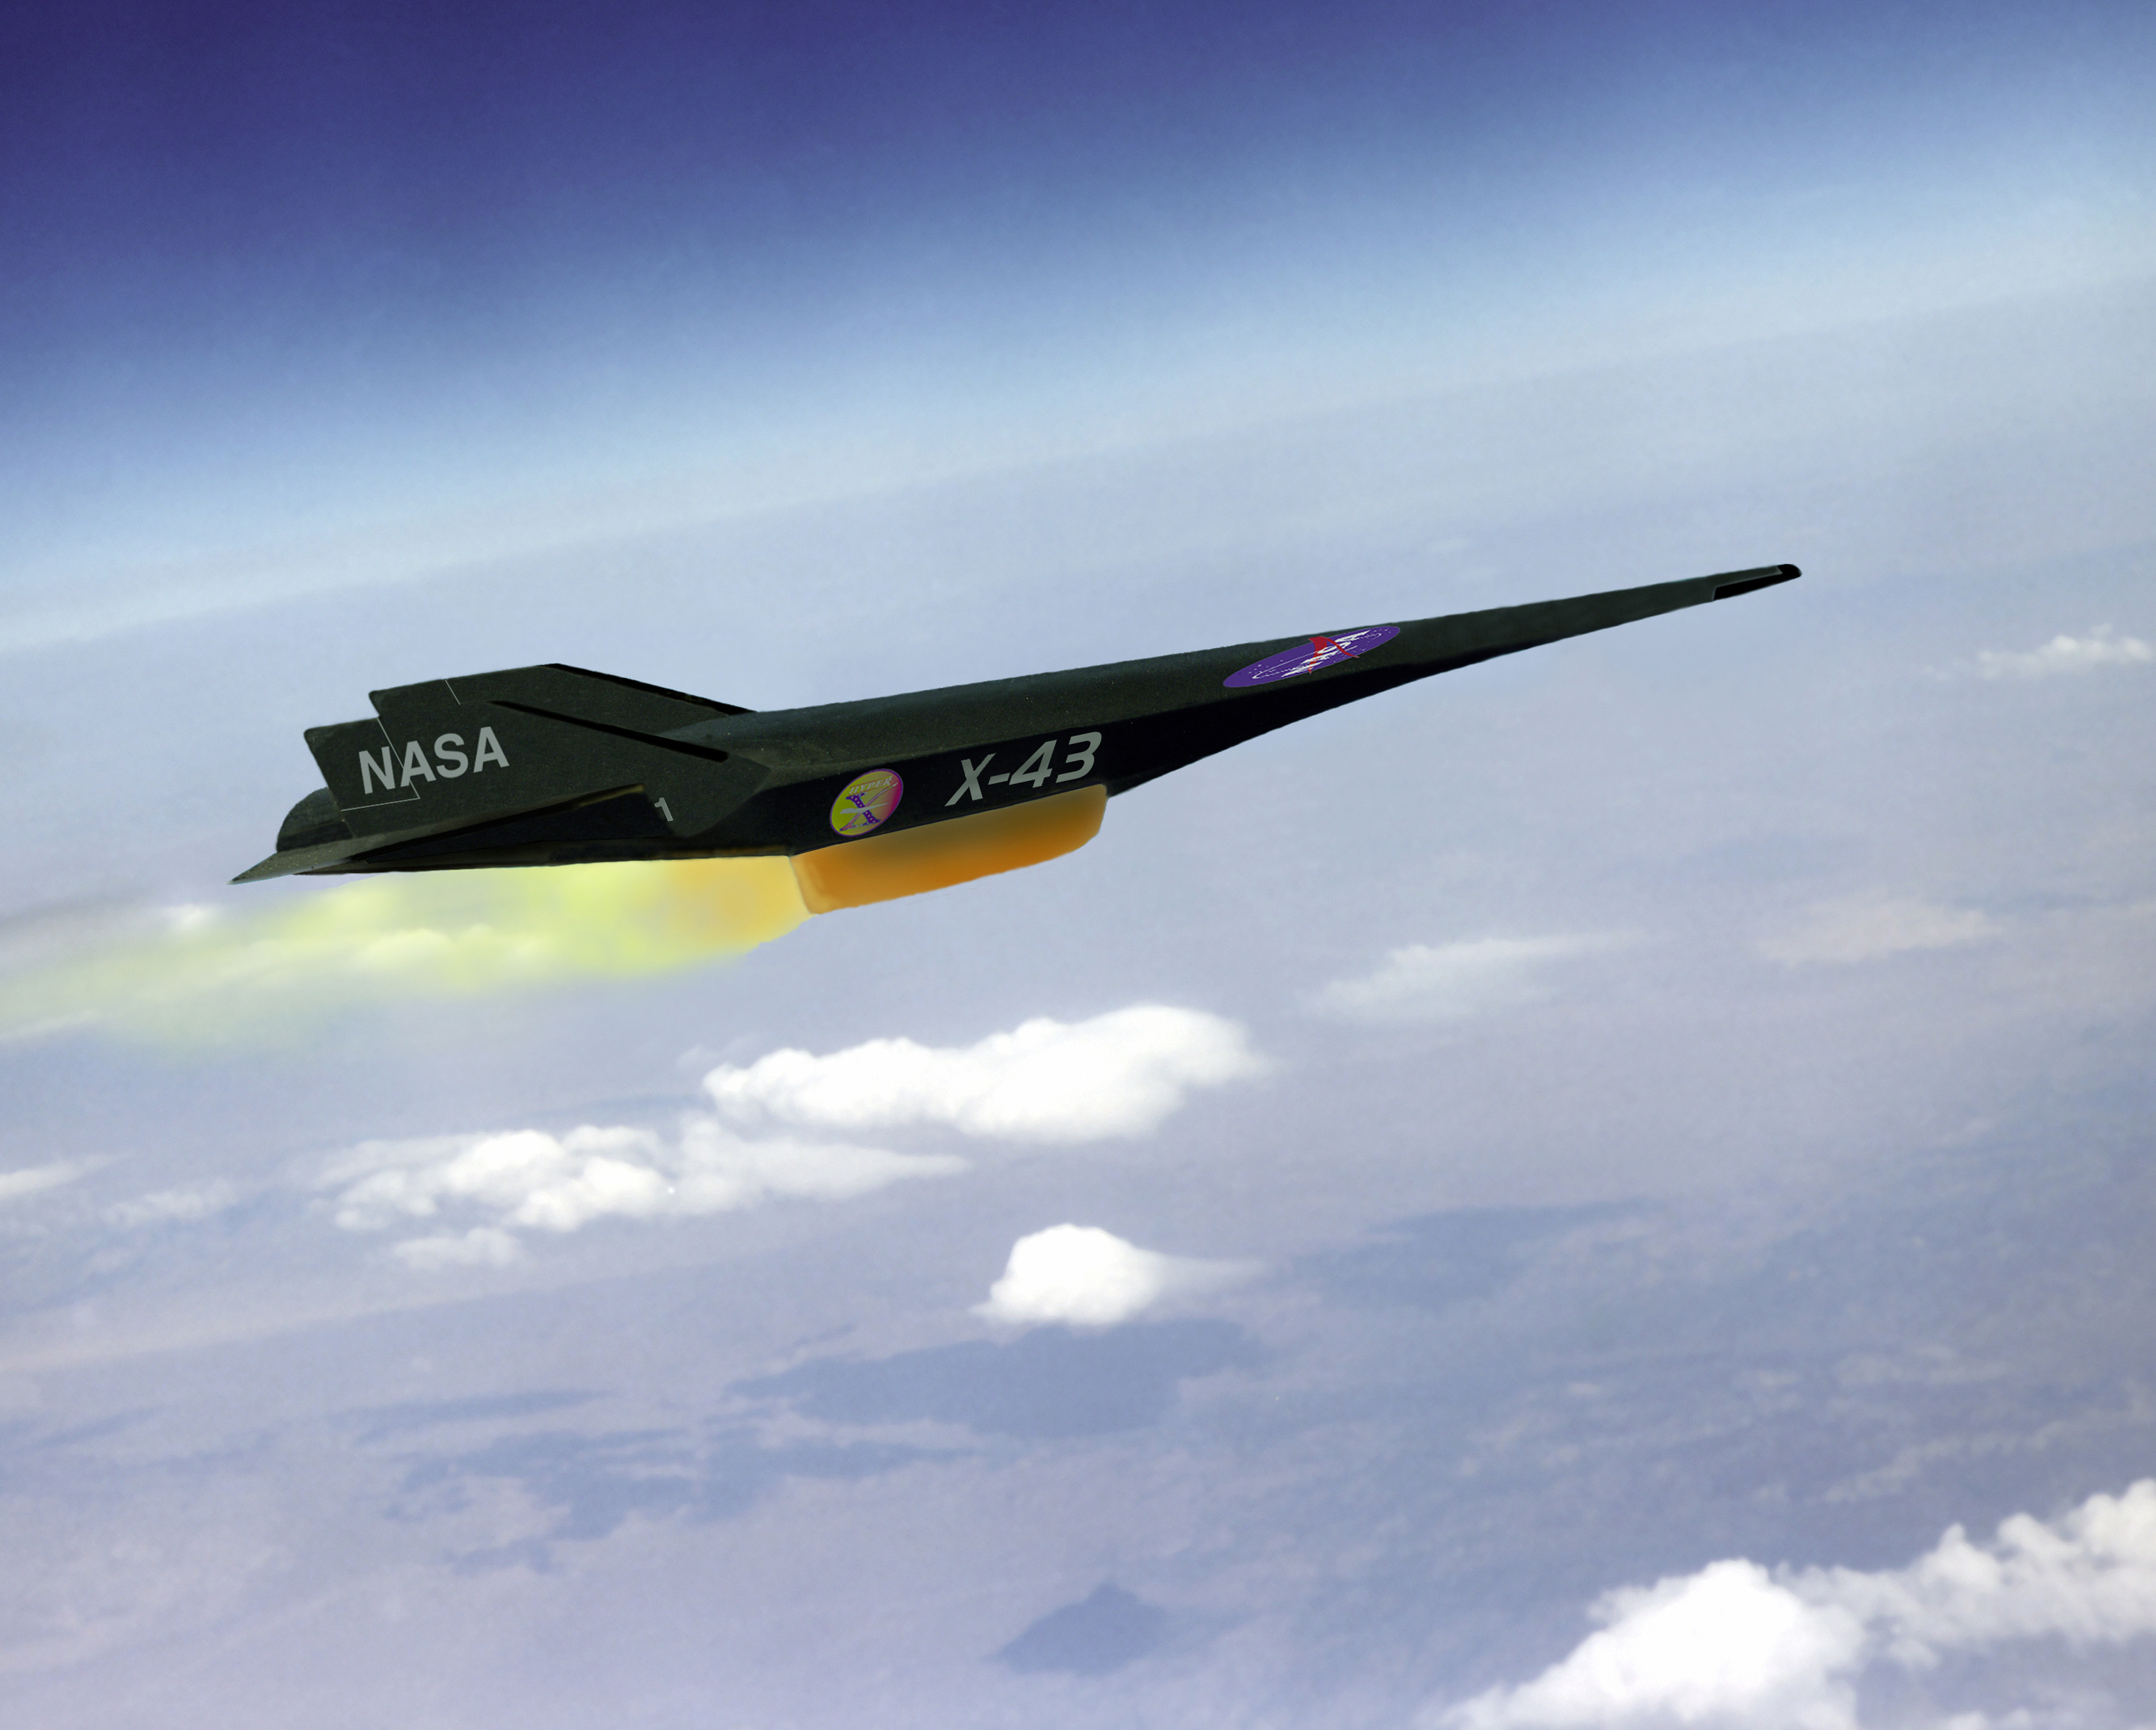 File:X-43 NASA.jpg